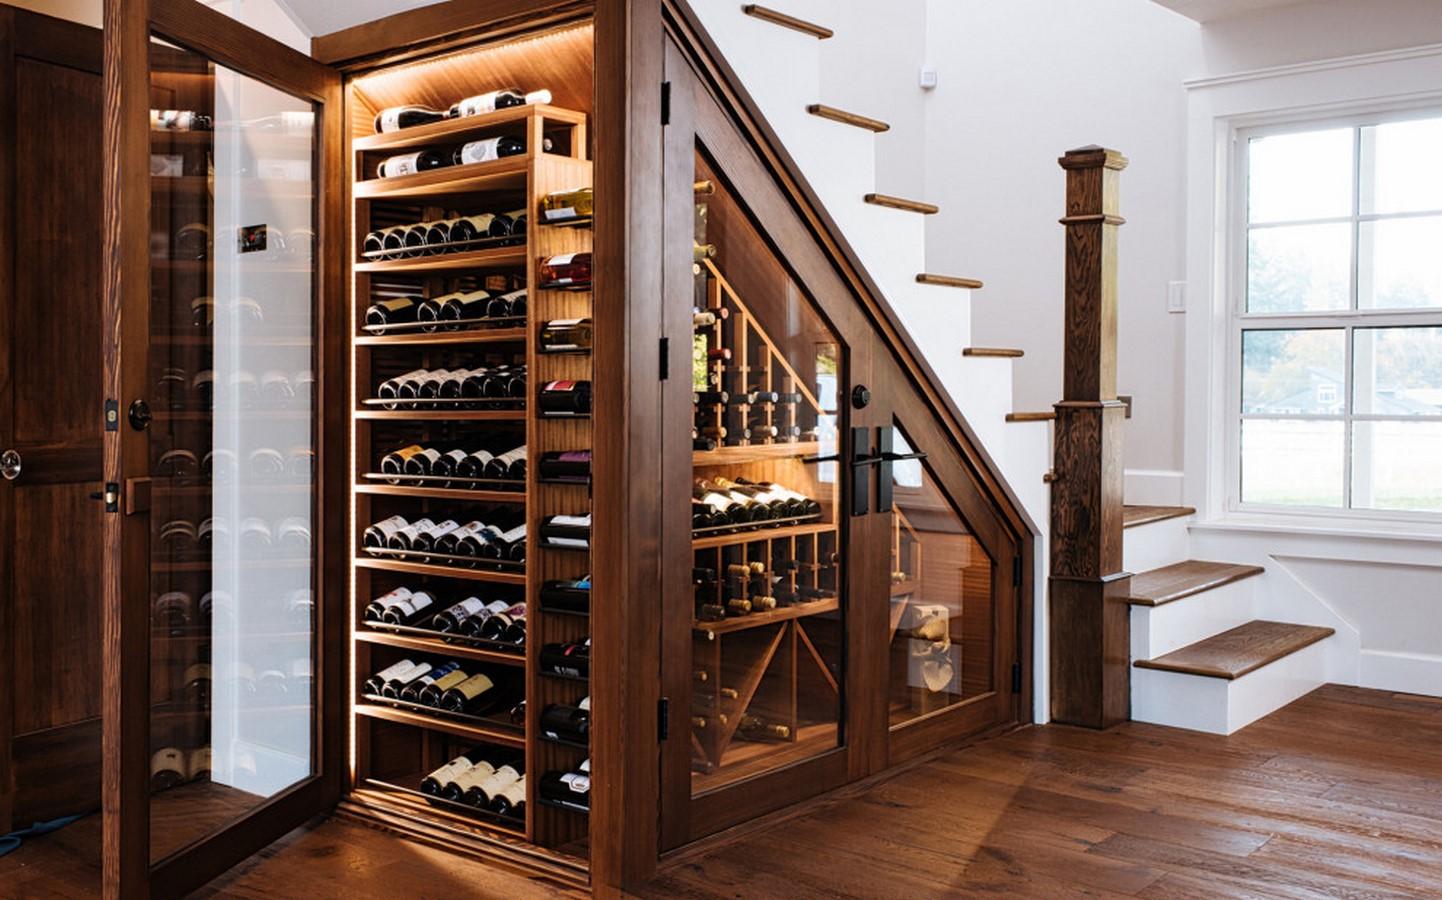 10 wine cellar design people should invest in - Sheet9